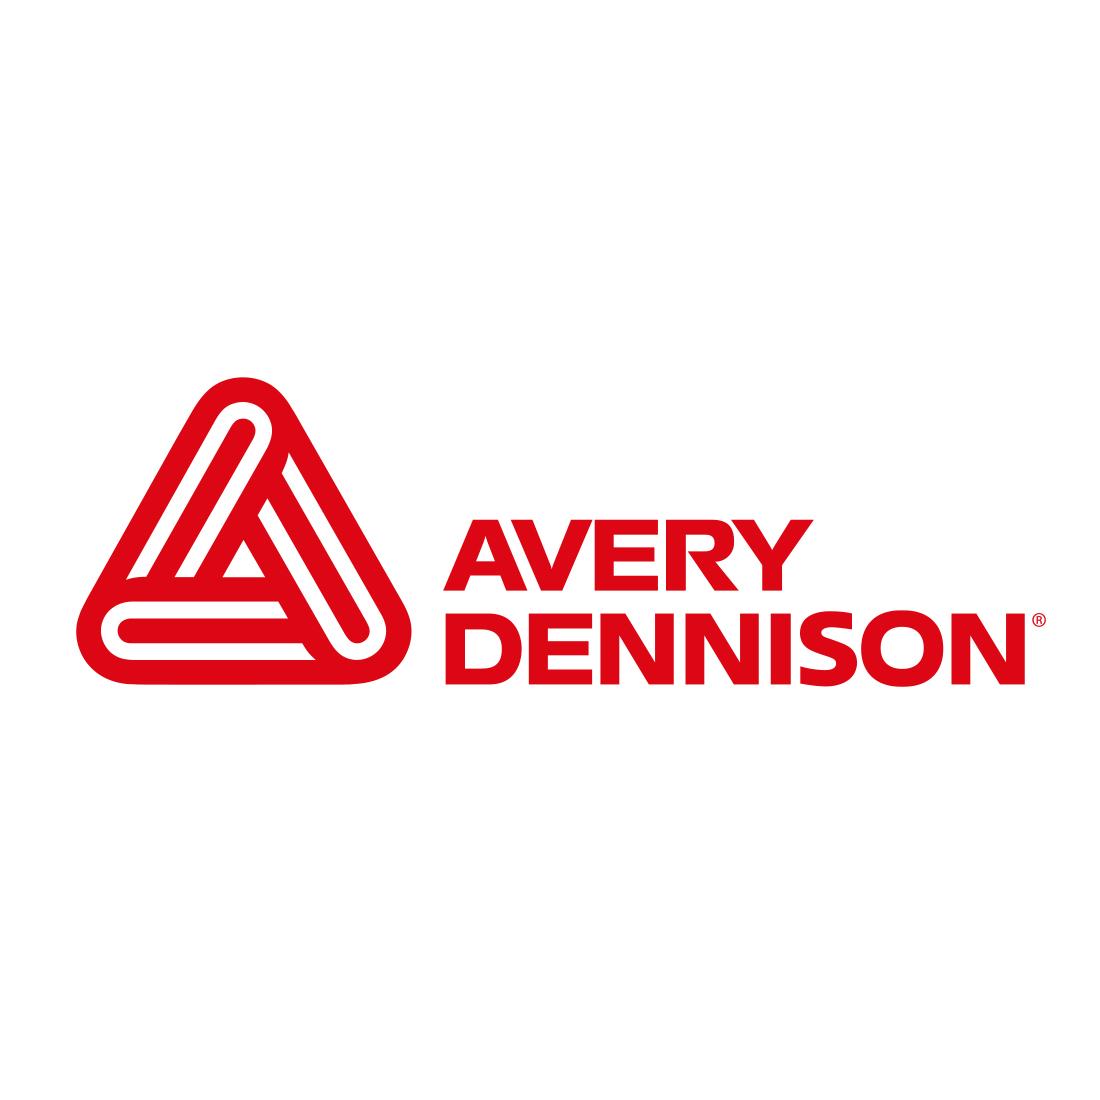 Avery Dennison 5100 Diffuser Film